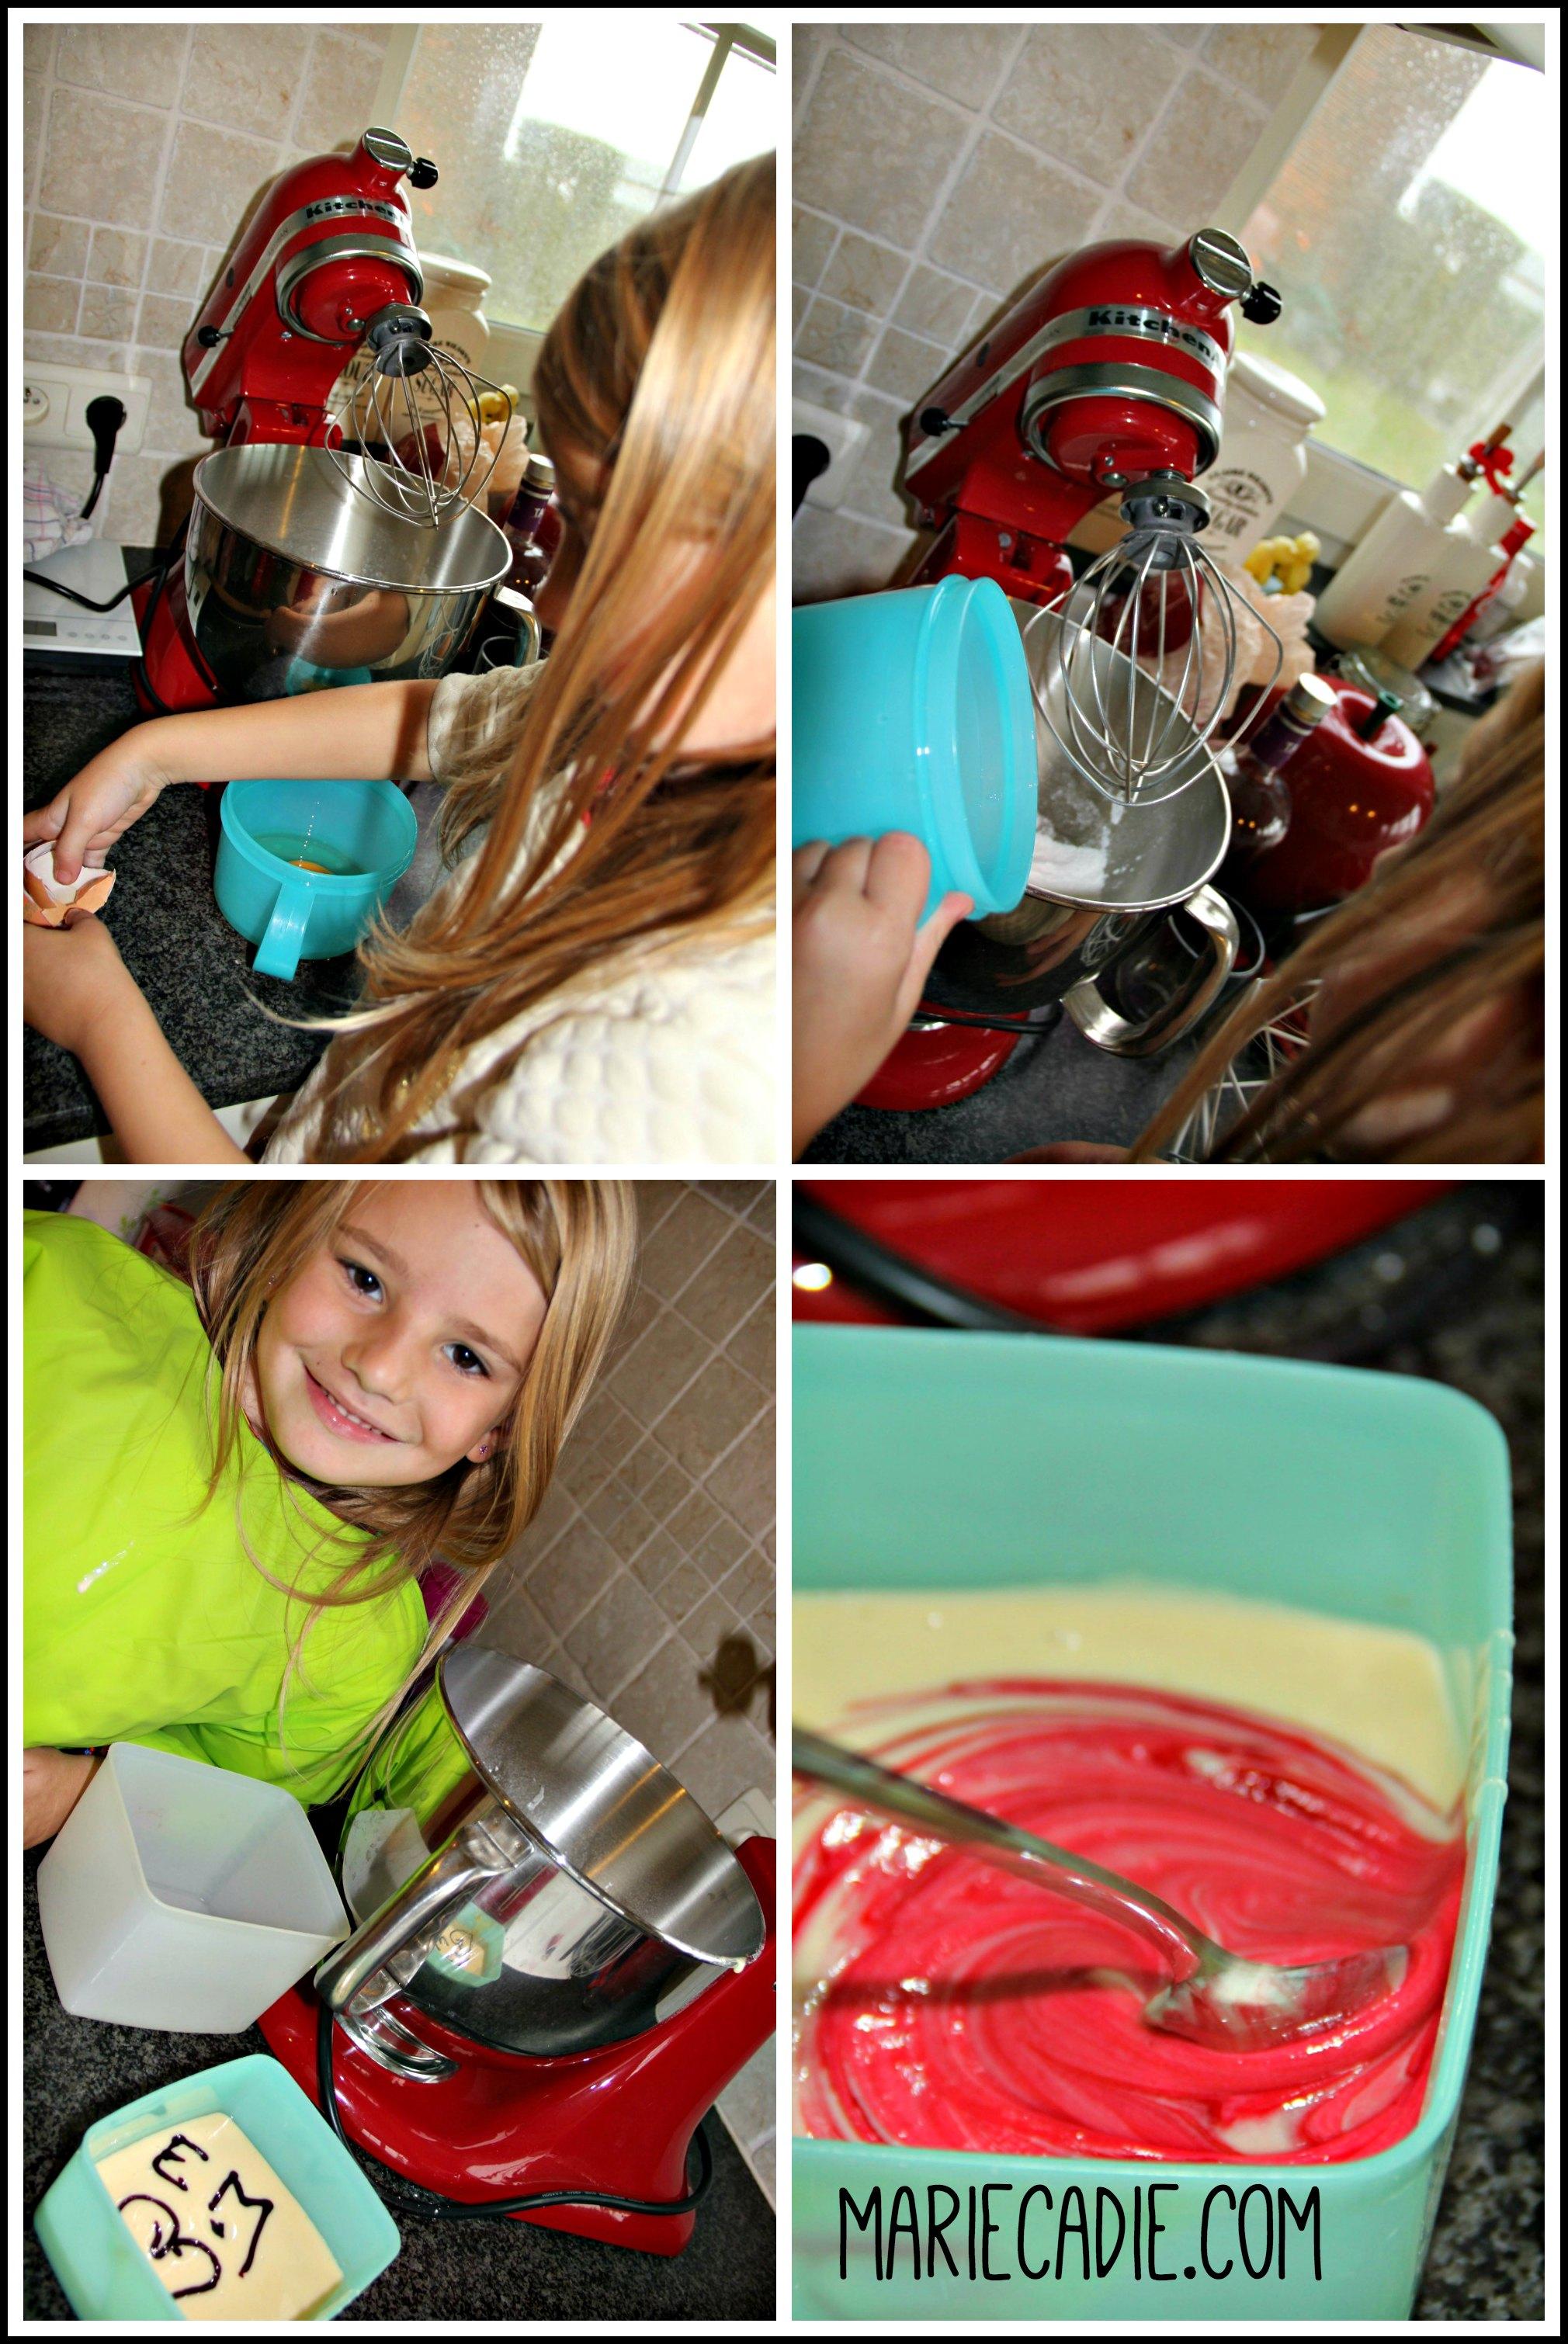 mariecadie-com-red-velvet-rainbow-cupcakes-collage